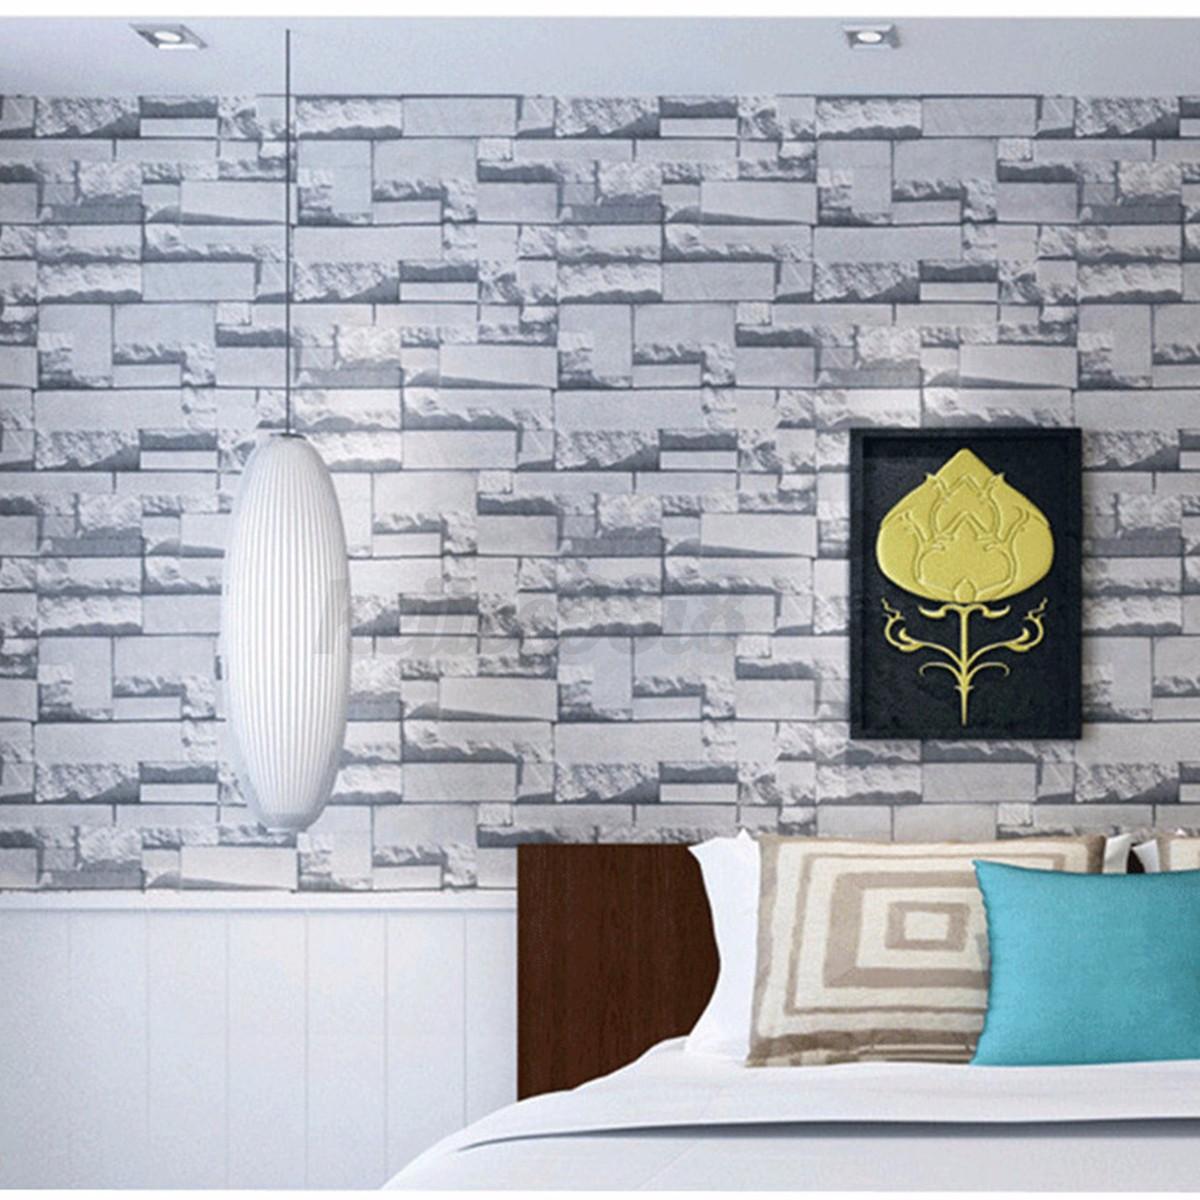 3d stein tapete vlies steintapete fototapeten umweltschutz wallpaper wand deko ebay. Black Bedroom Furniture Sets. Home Design Ideas